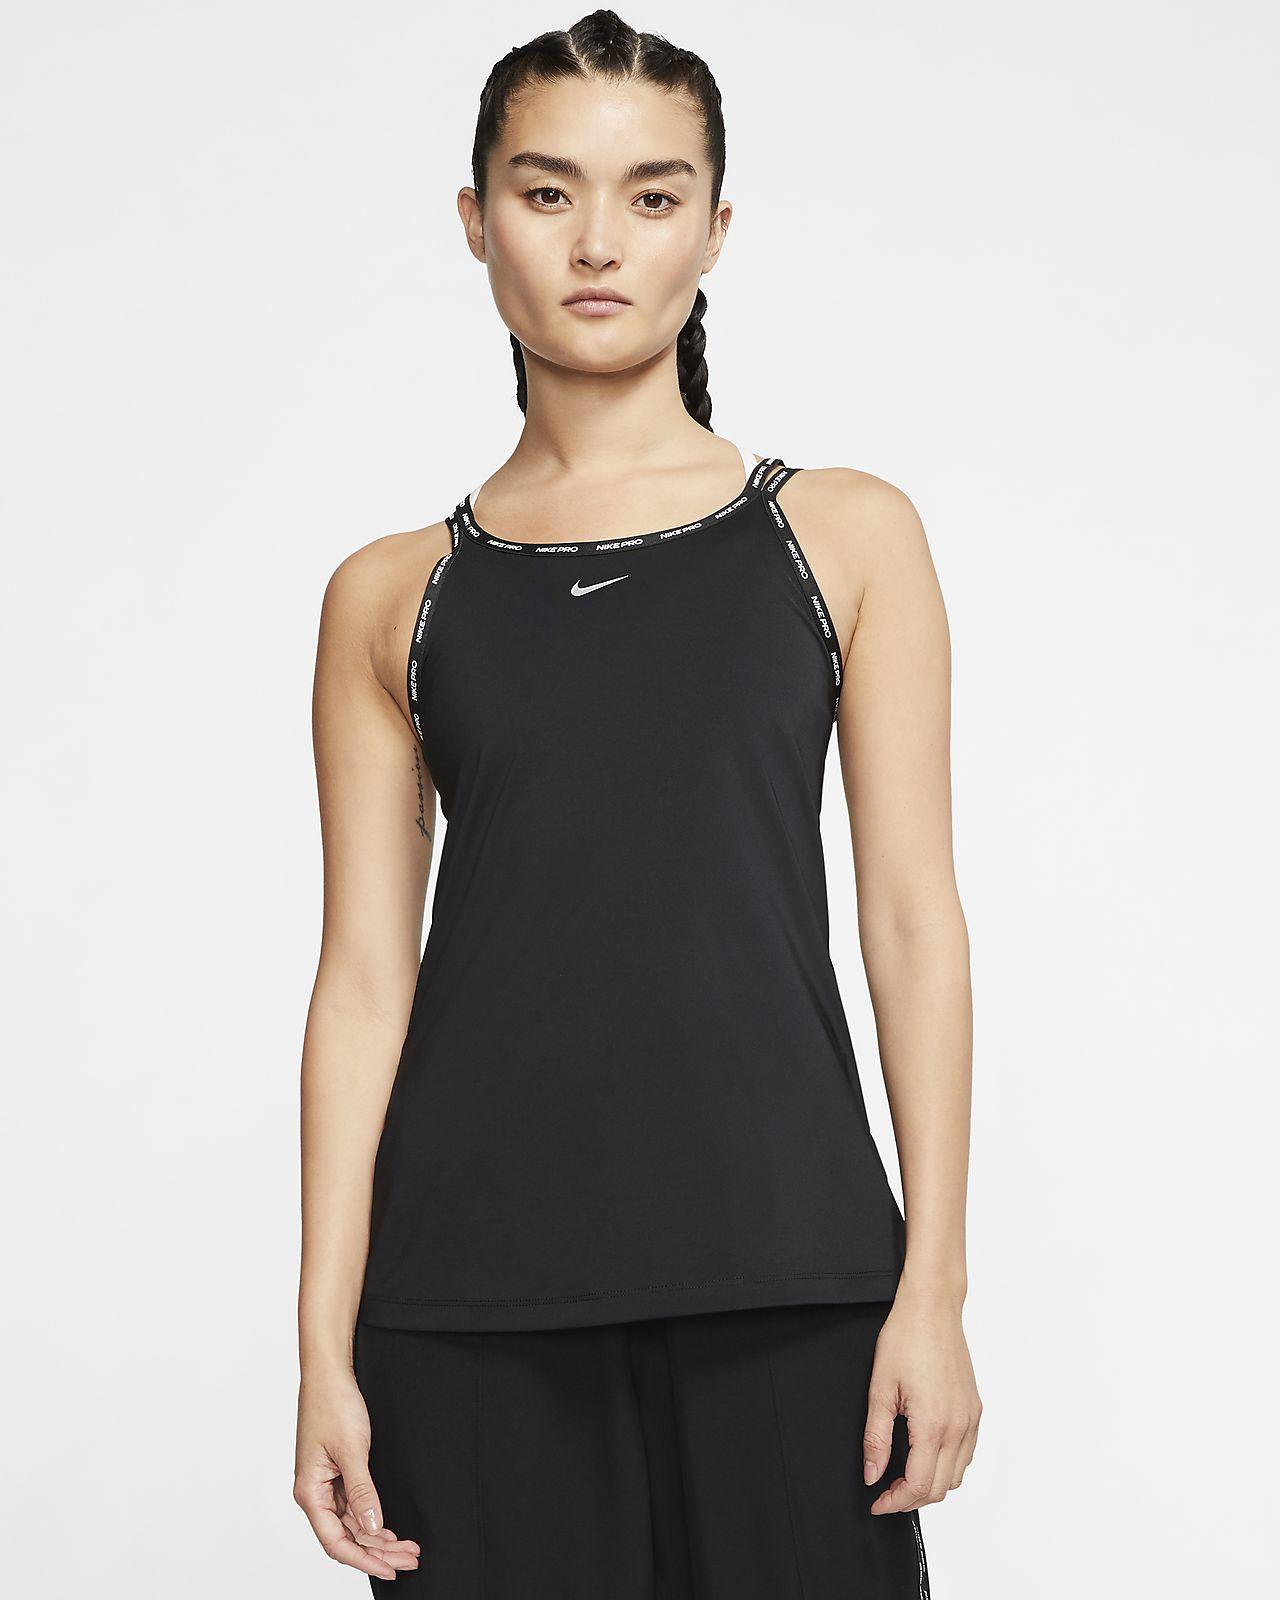 Damska koszulka bez rękawów Nike Pro